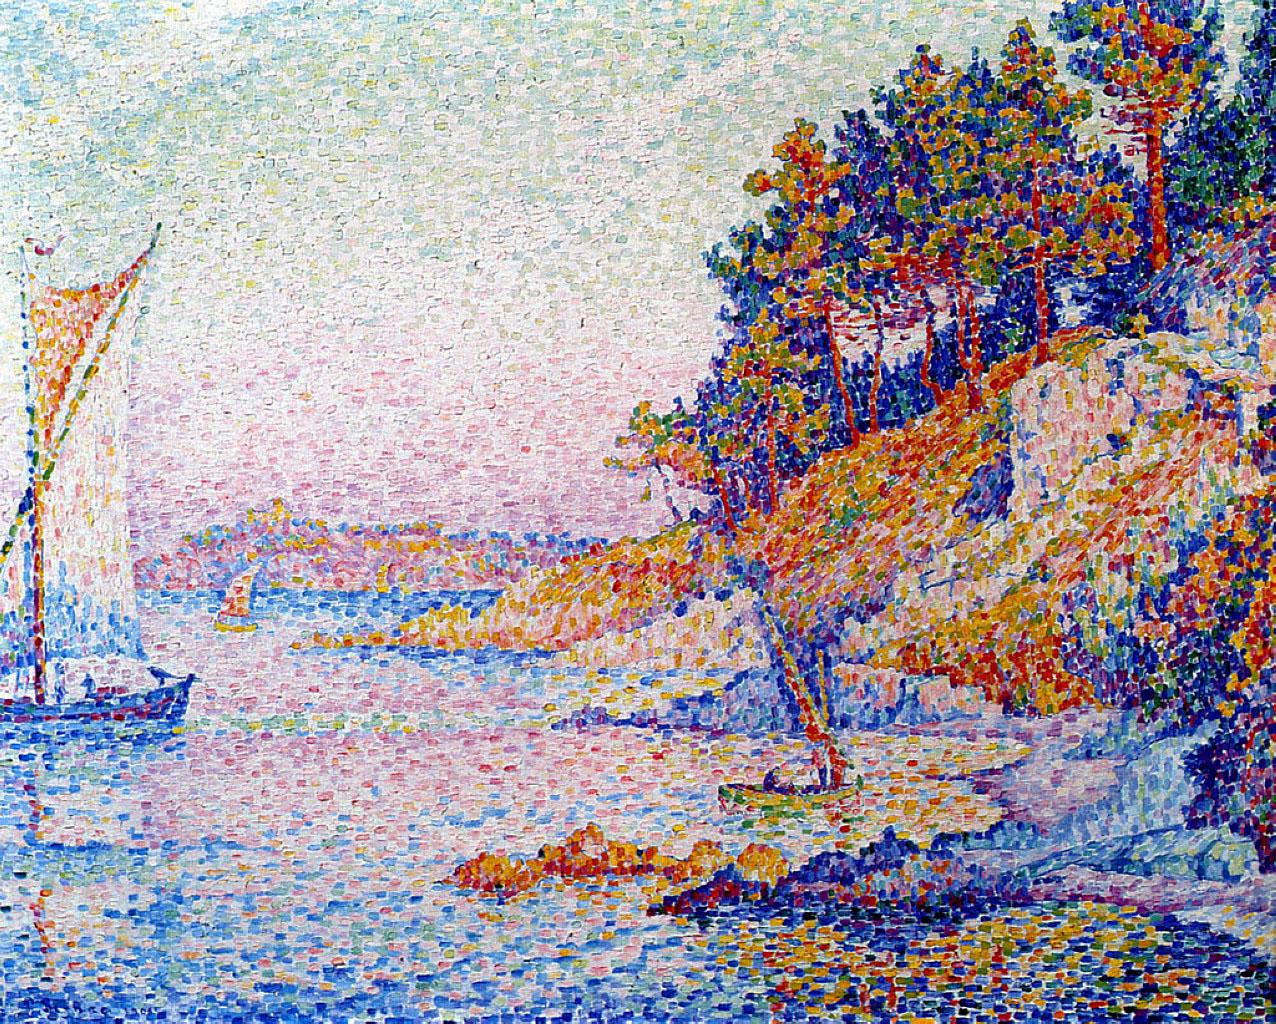 Pol-Sinyak-Paul-Signac-Saint-Tropez.-The-Calanque-1906.jpg